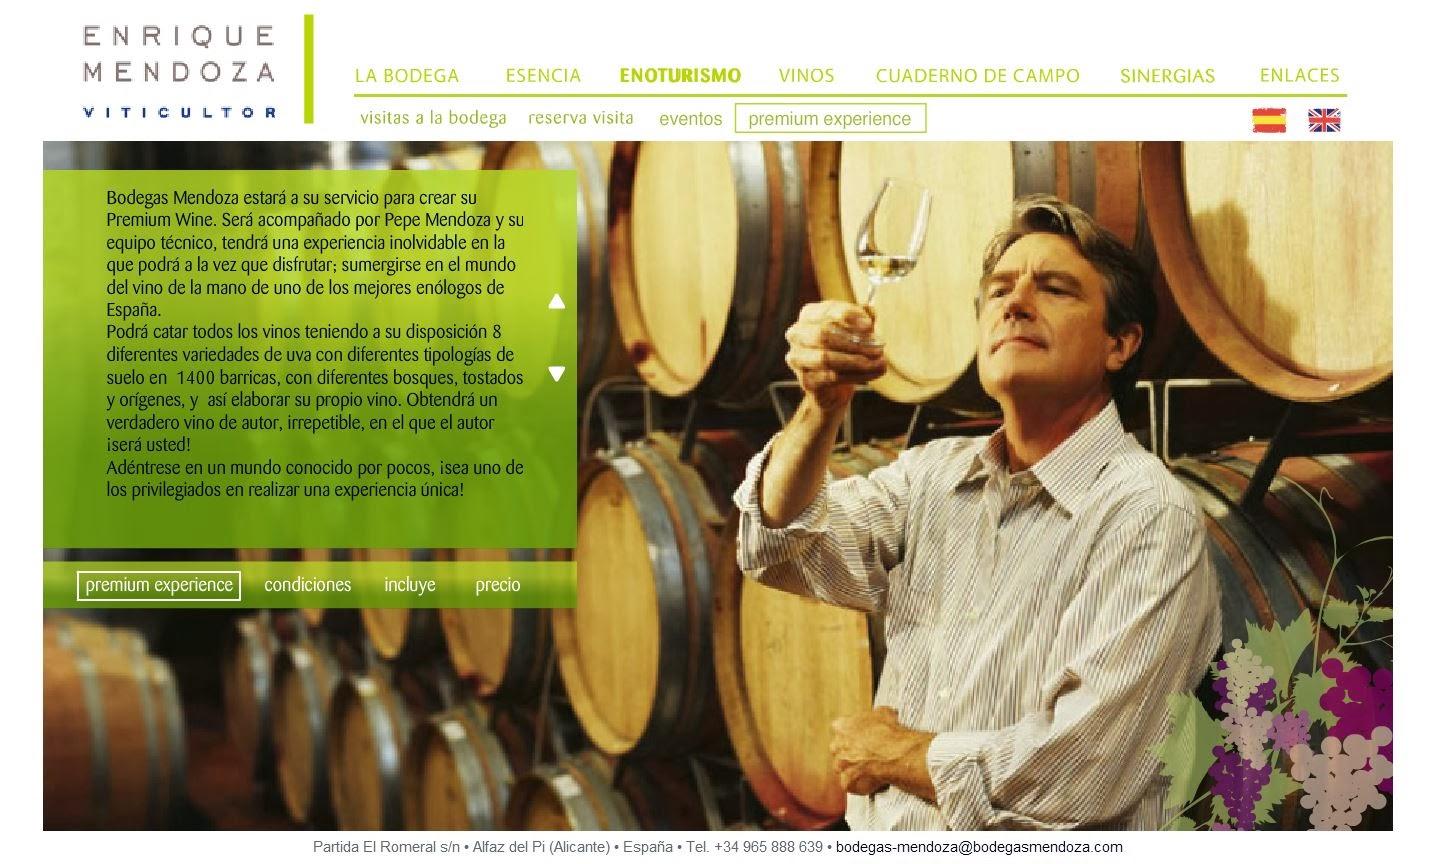 Imagen-Premium-Experience-Bodegas-Enrique-Mendoza